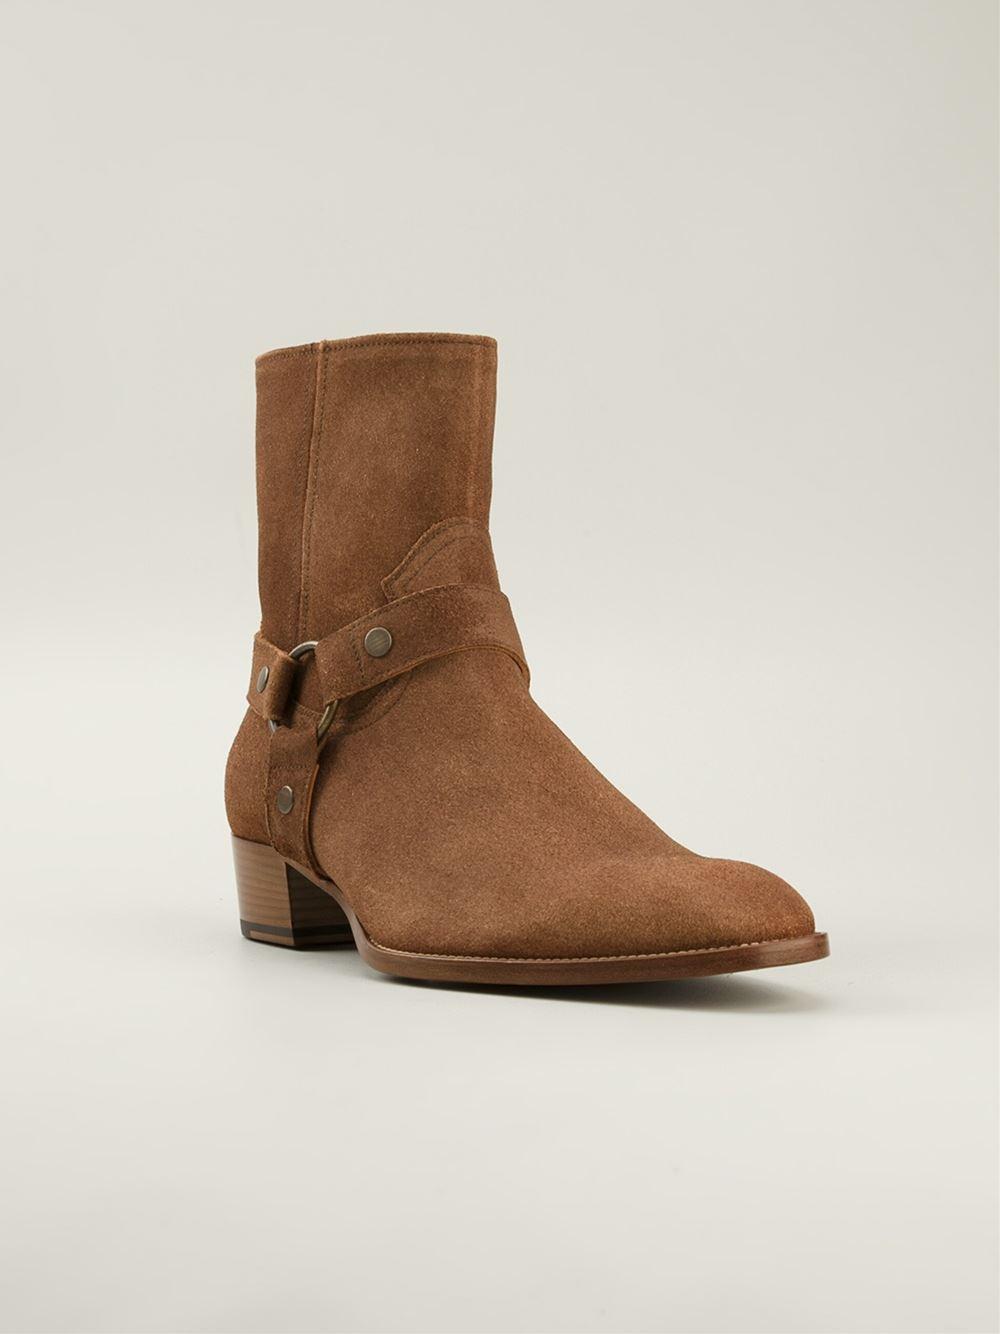 Saint Laurent 'wyatt' Ankle Boots - Vitkac - Farfetch.com